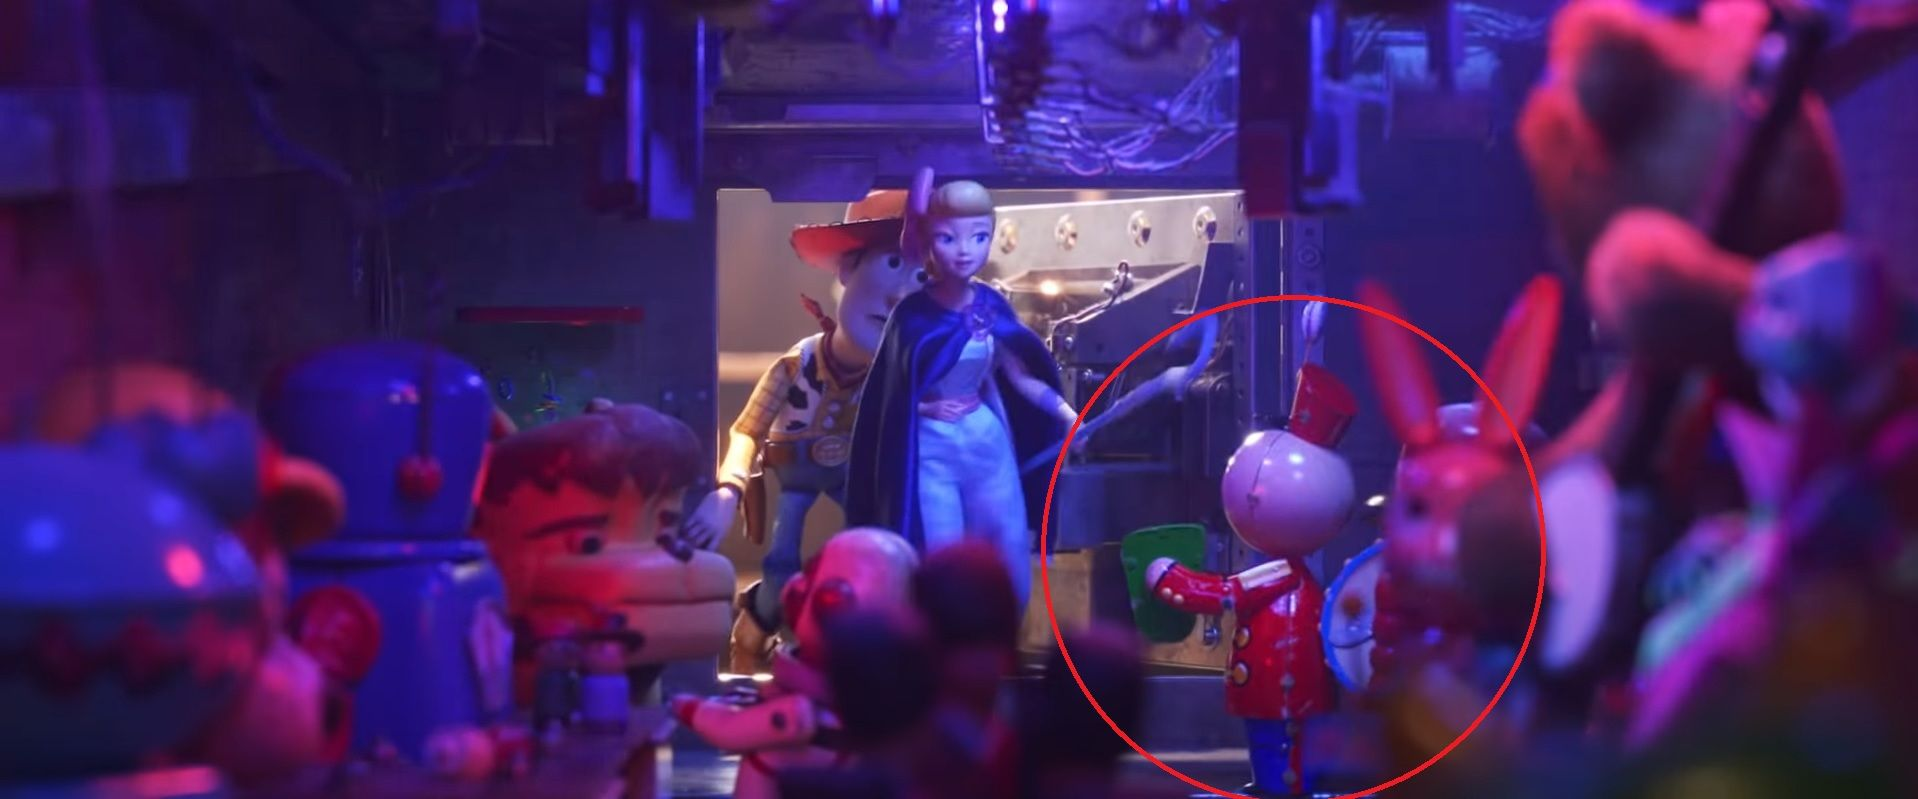 'Tin Toy', el origen de 'Toy Story' regresa en 'Toy Story 4'